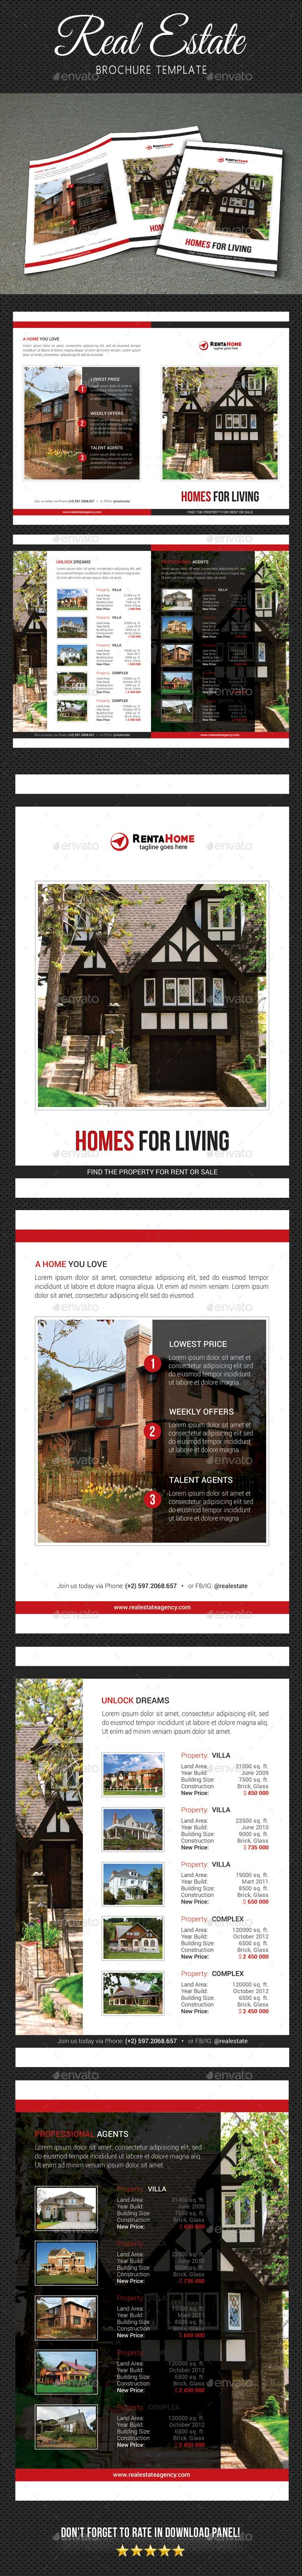 Real Estate Brochure  Brochures Print Templates And Brochure